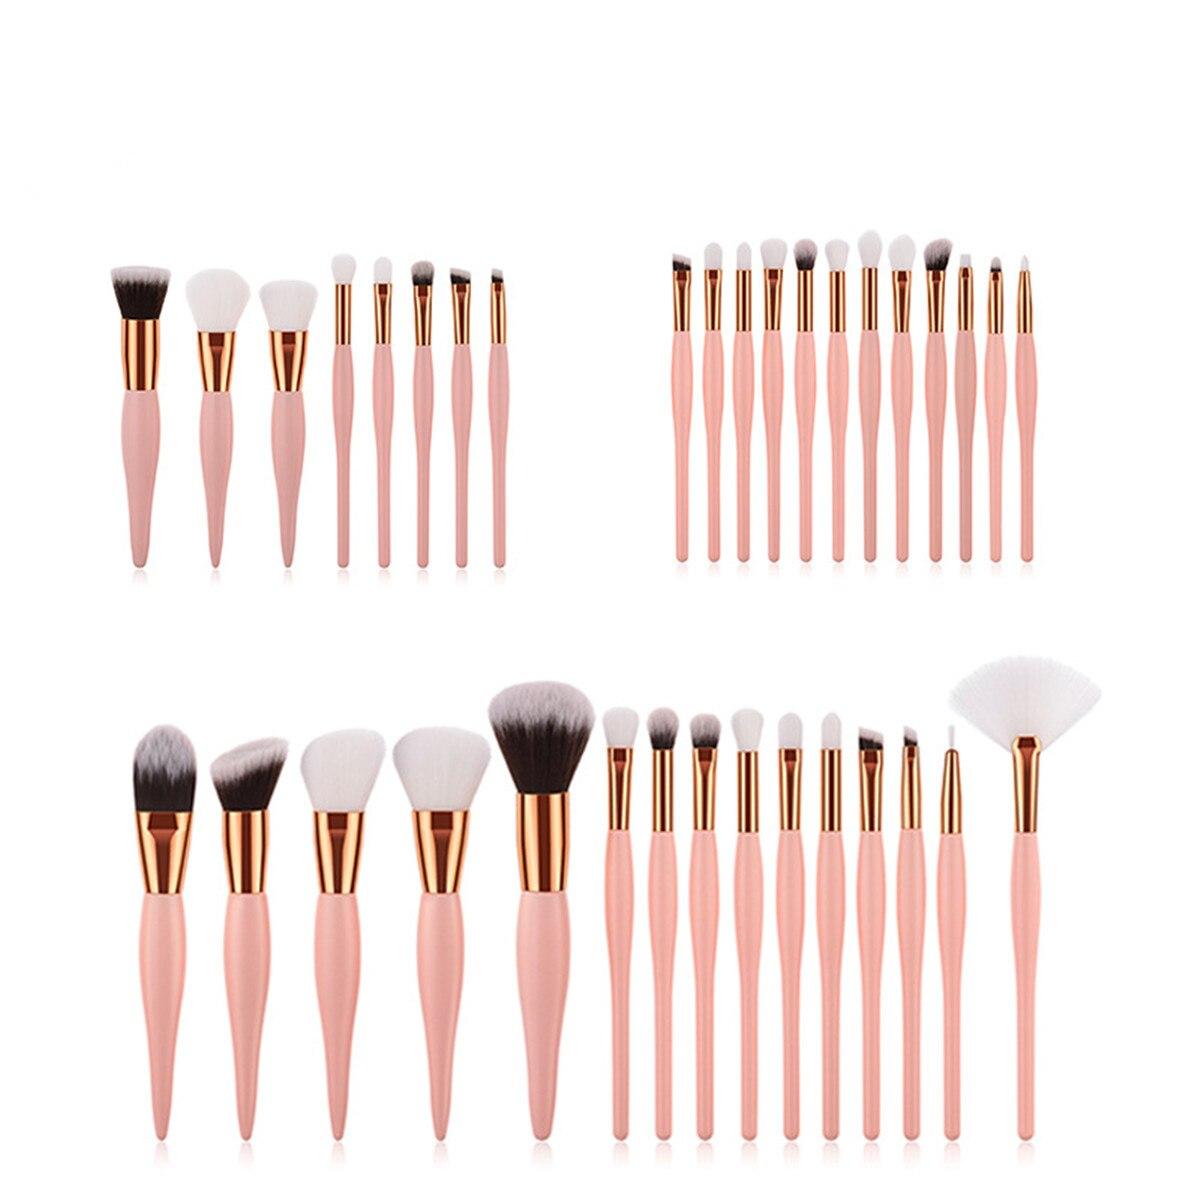 15/12/8Pcs Eye Brush Makeup Brush Set Eye Shadow Lip Eyebrow Brushes High Quality Professional Lip Eyeliner Tools Makeup Brushes